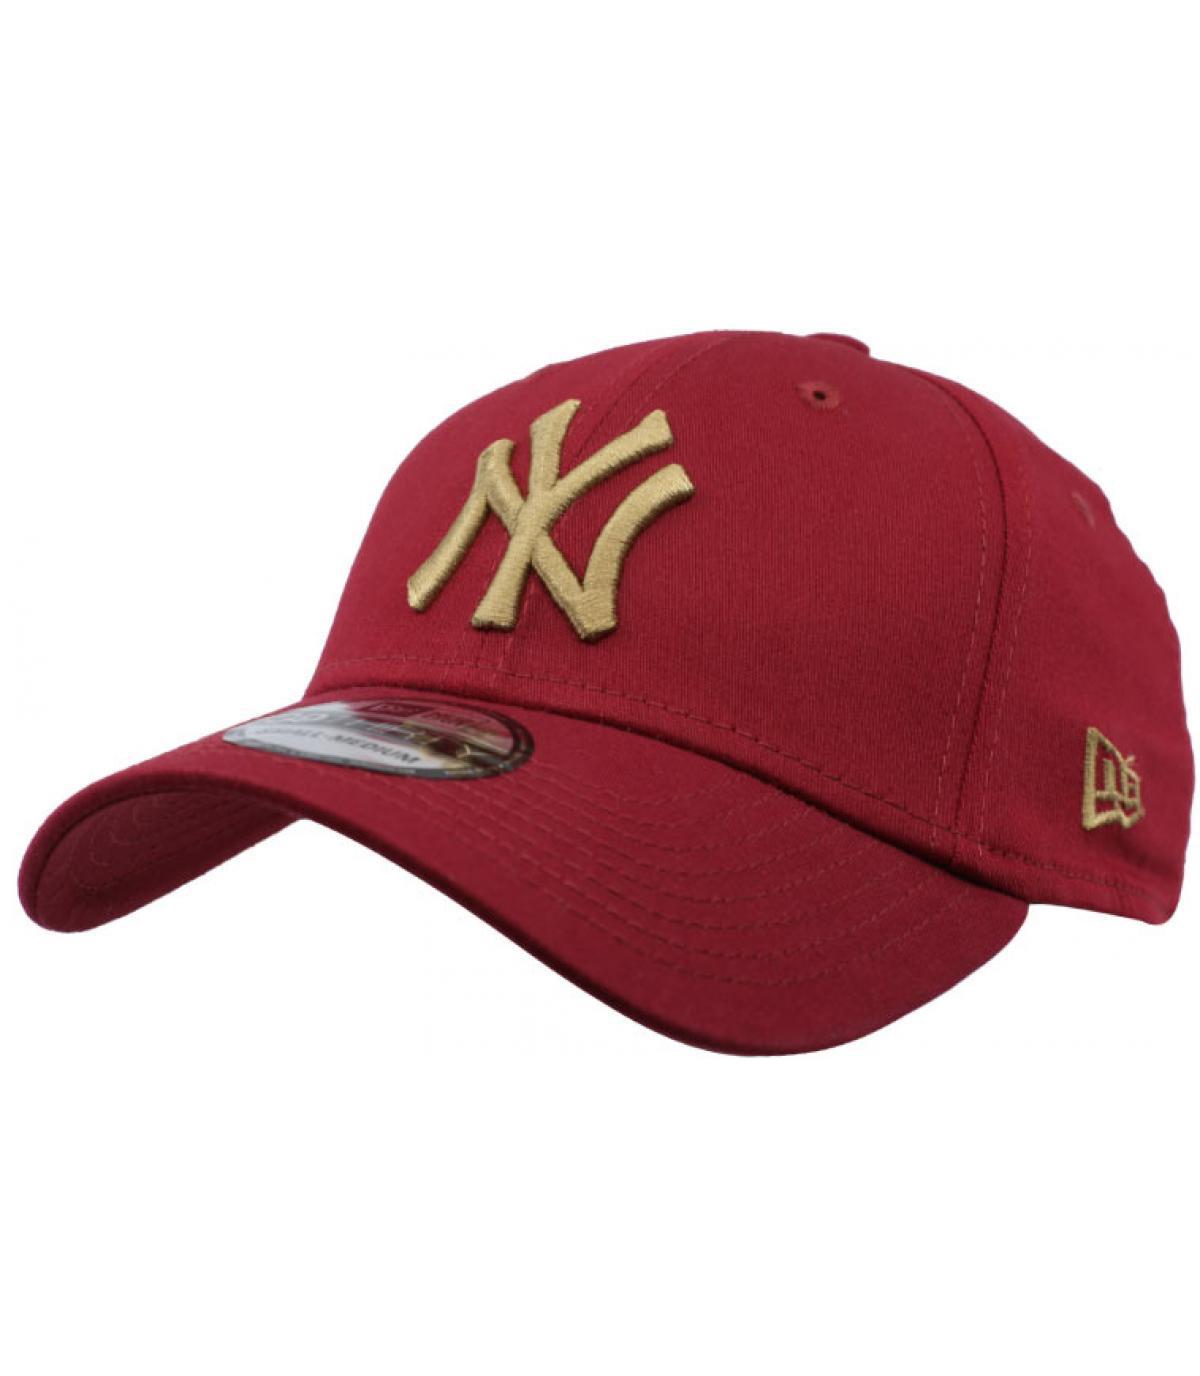 Dettagli League Ess NY 3930 cardinal wheat - image 2